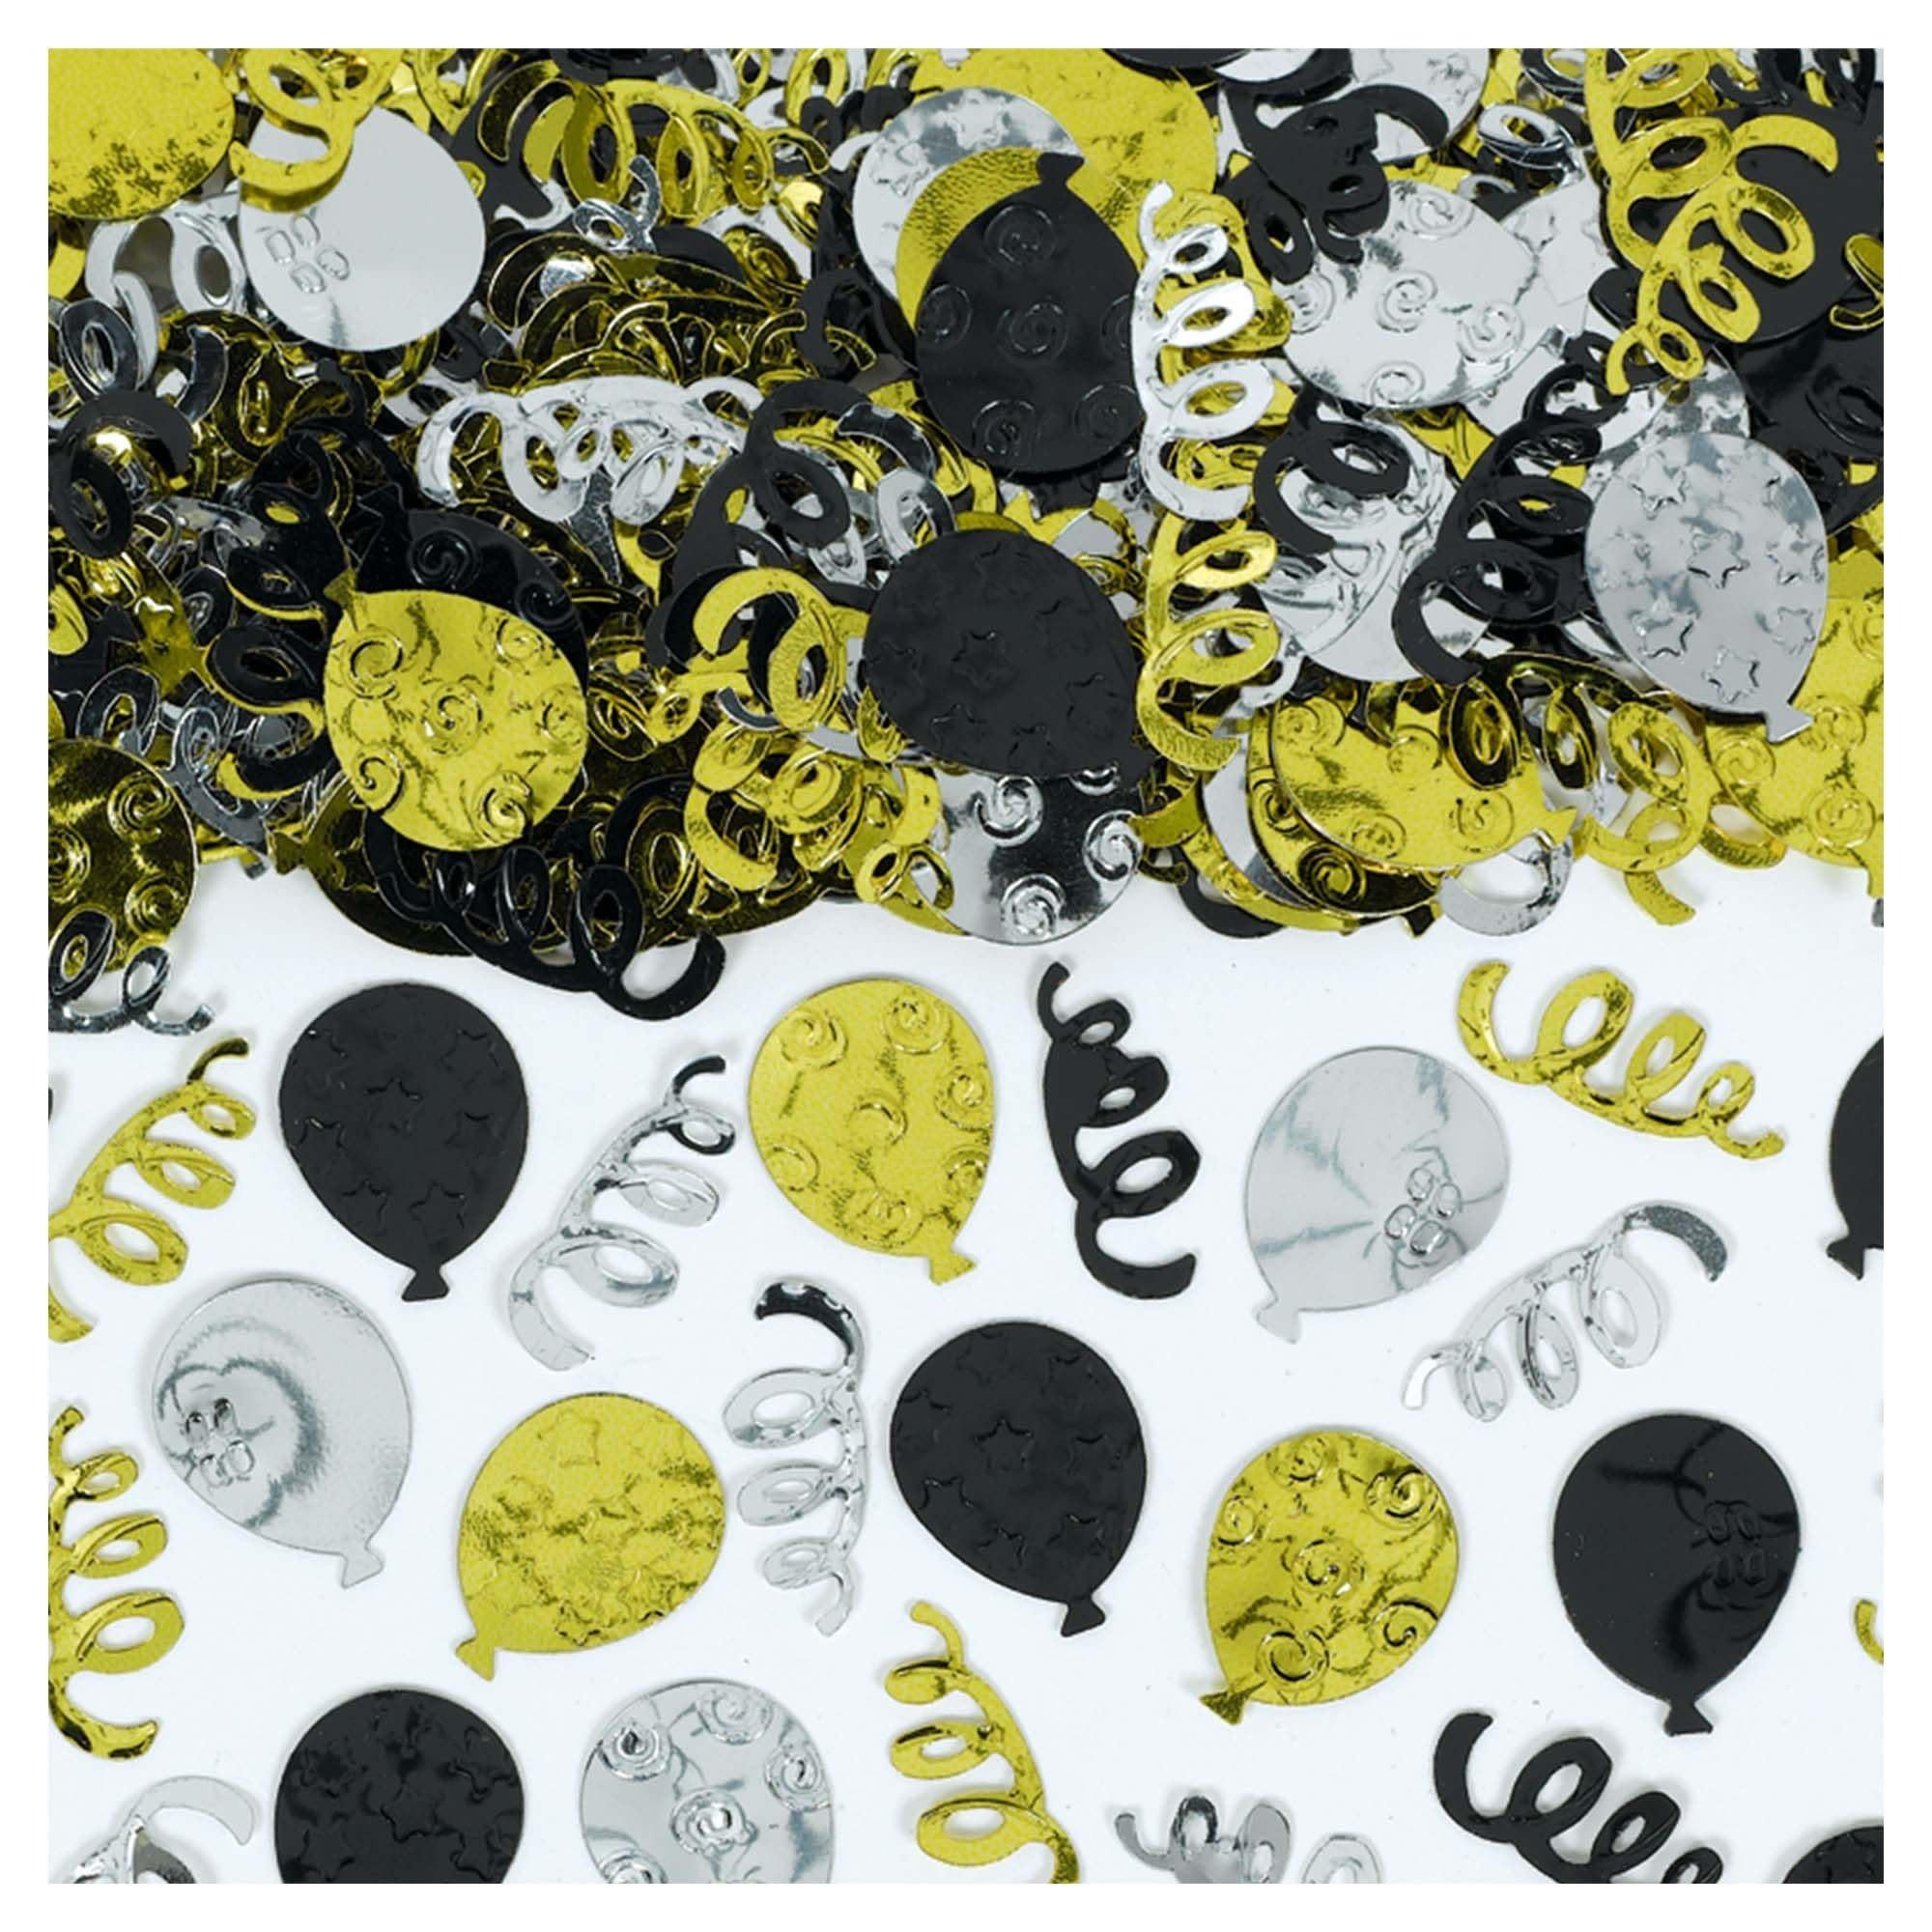 Black, Silver & Gold Party Balloons Confetti